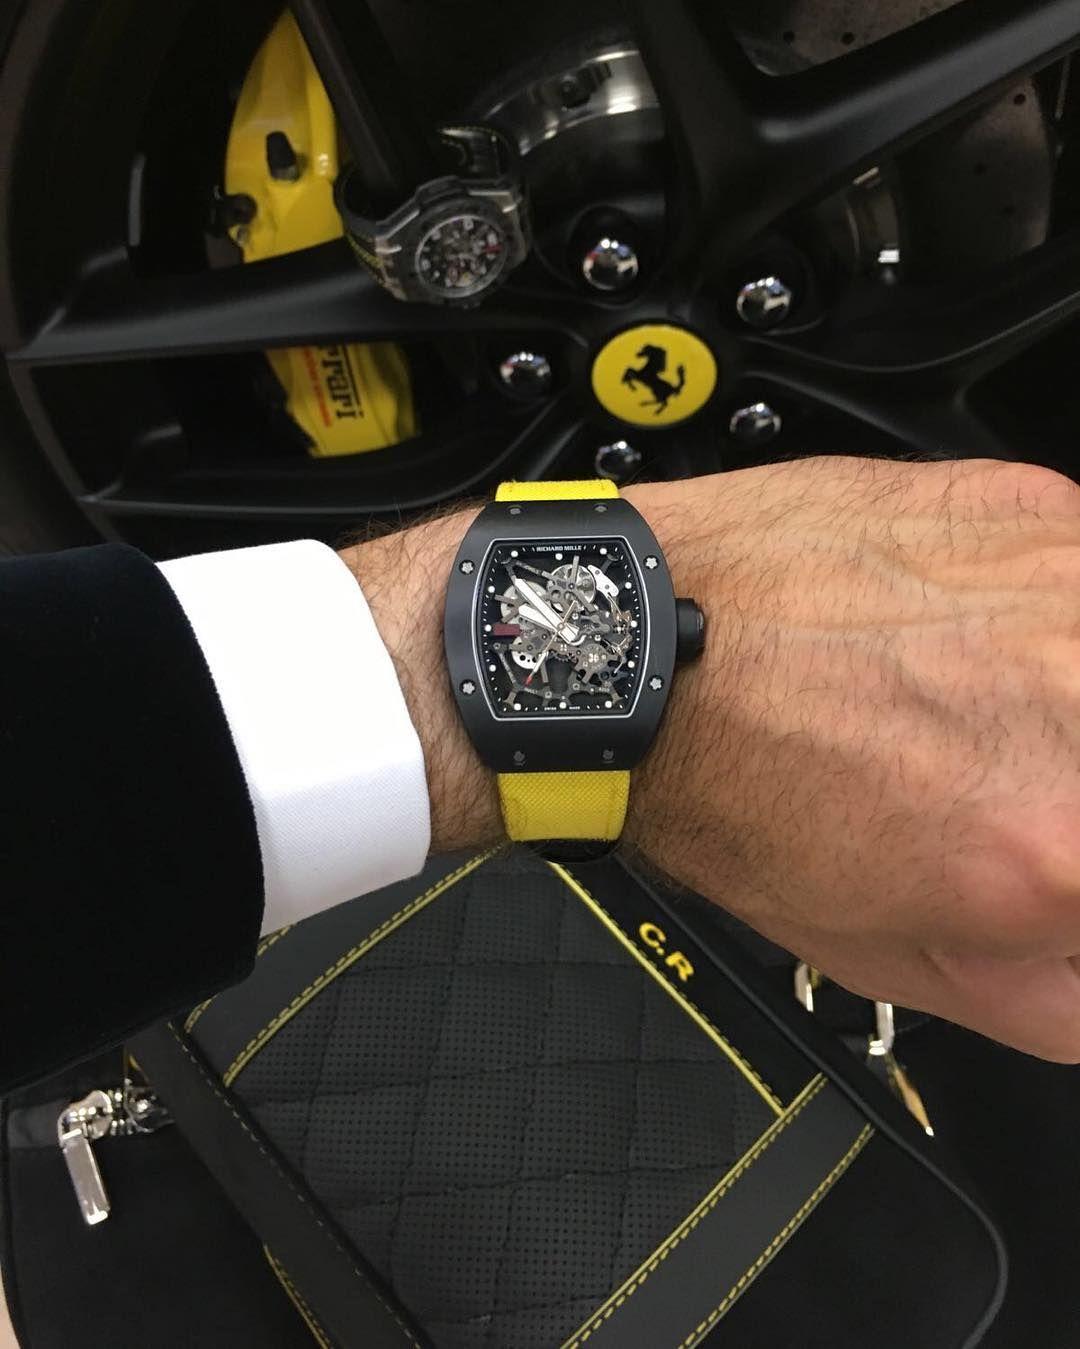 Pin By Maffbags On Yang Saya Simpan Richard Mille Ferrari Casio Watch